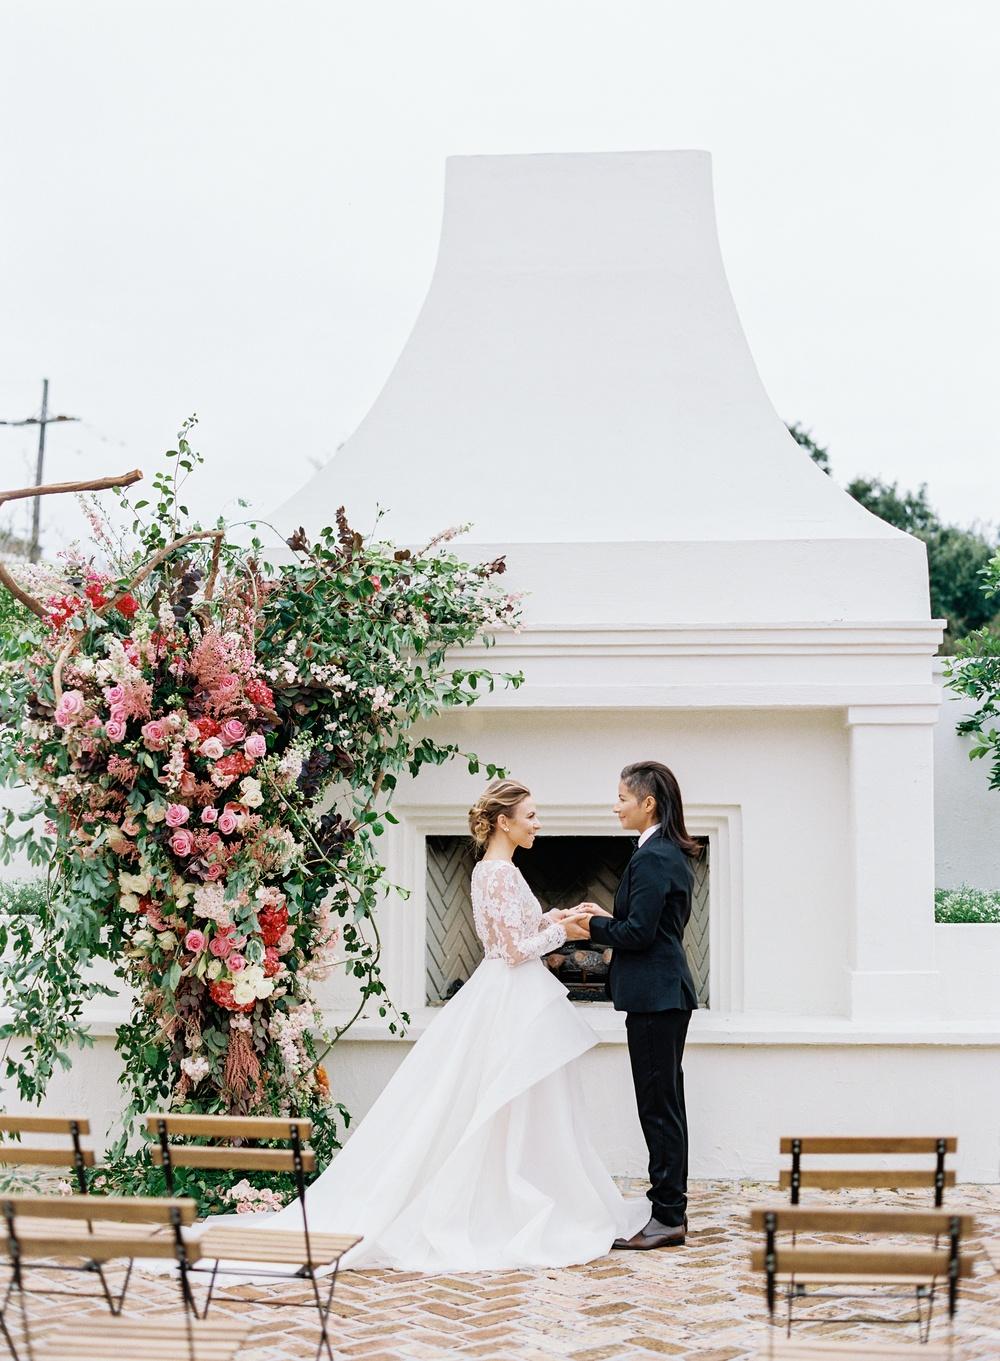 ruffled ballgown wedding dress with a black suit same sex wedding